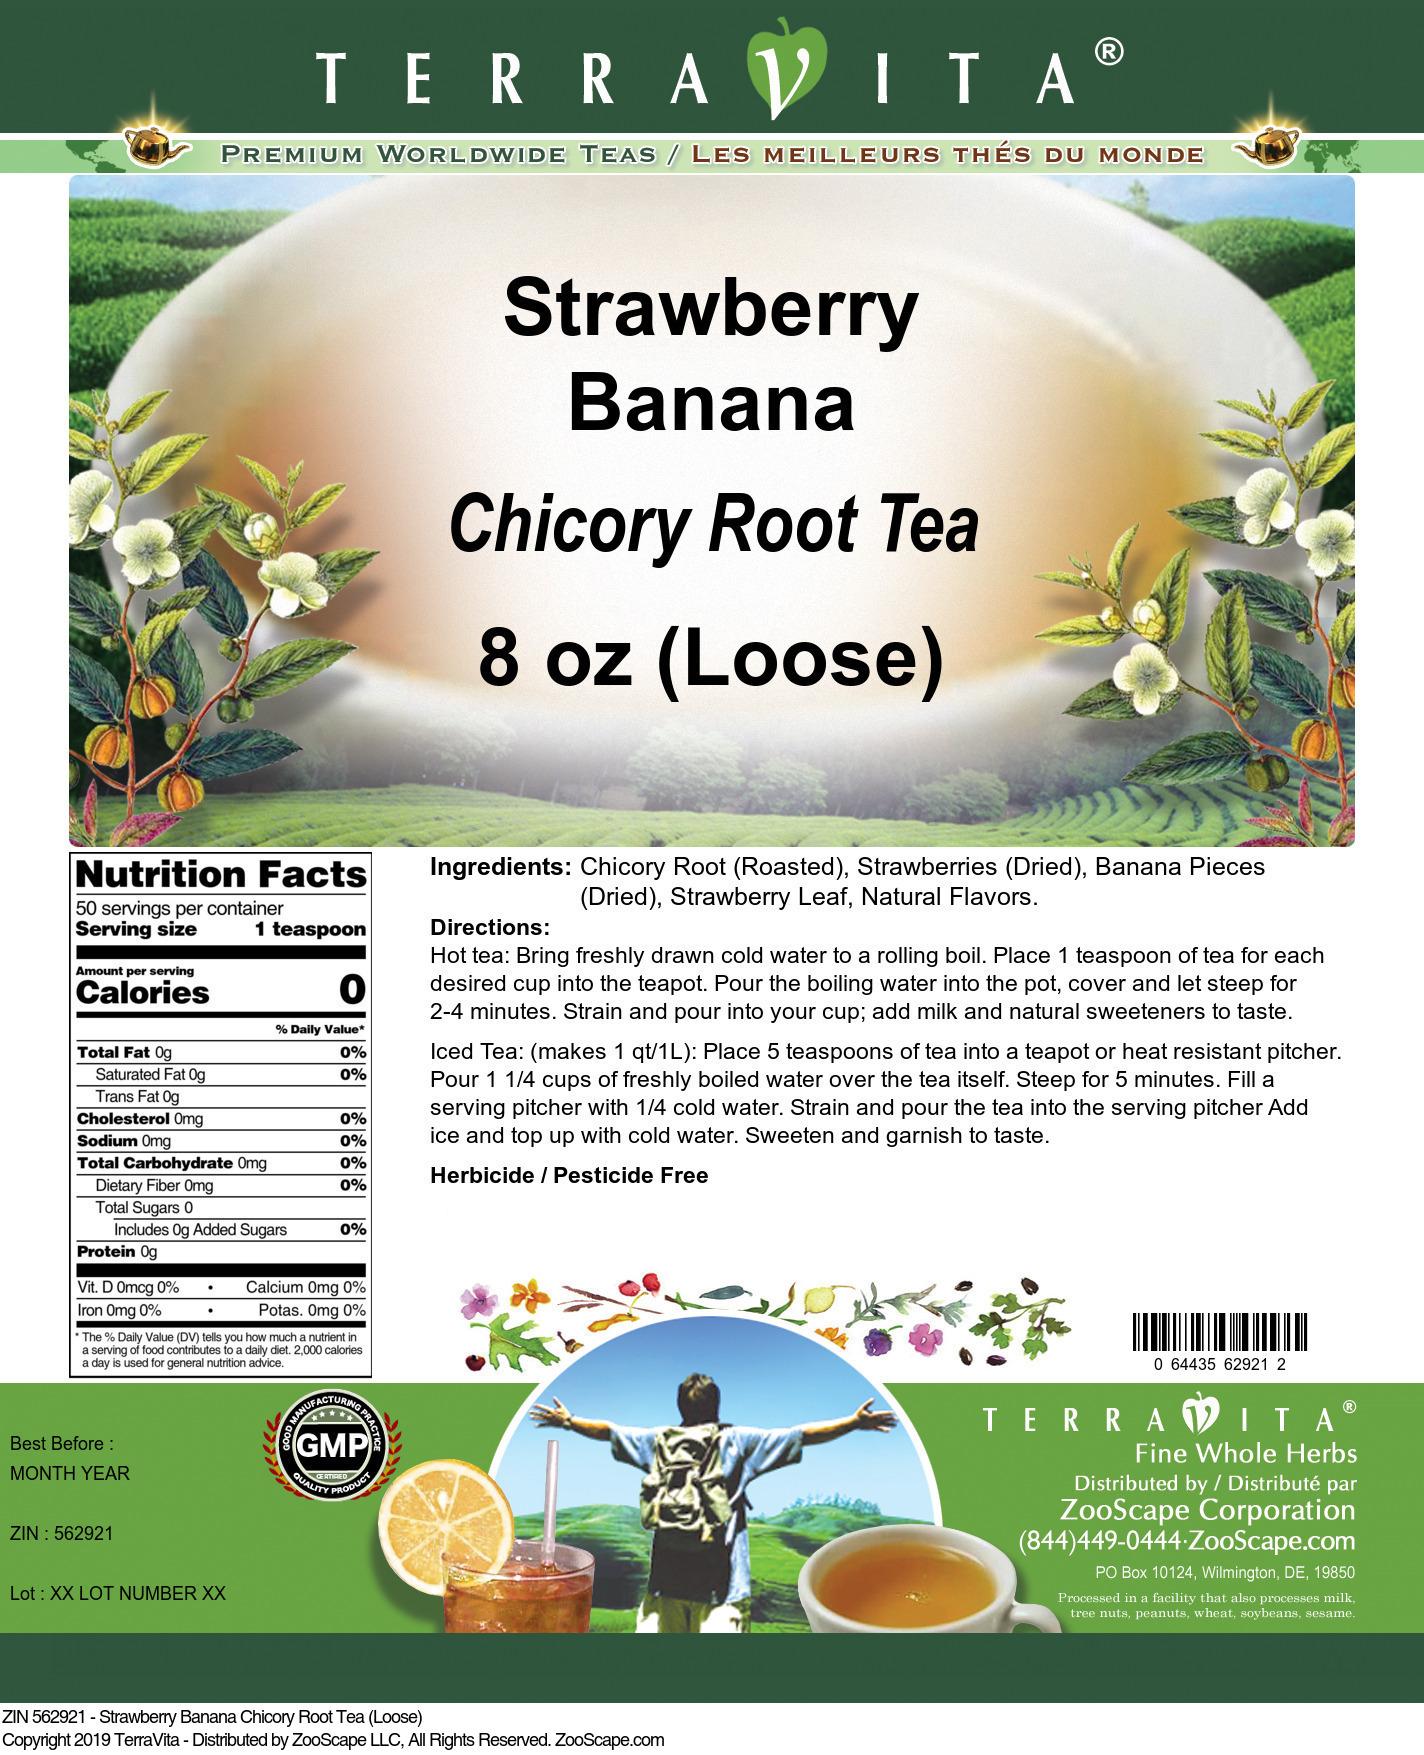 Strawberry Banana Chicory Root Tea (Loose)